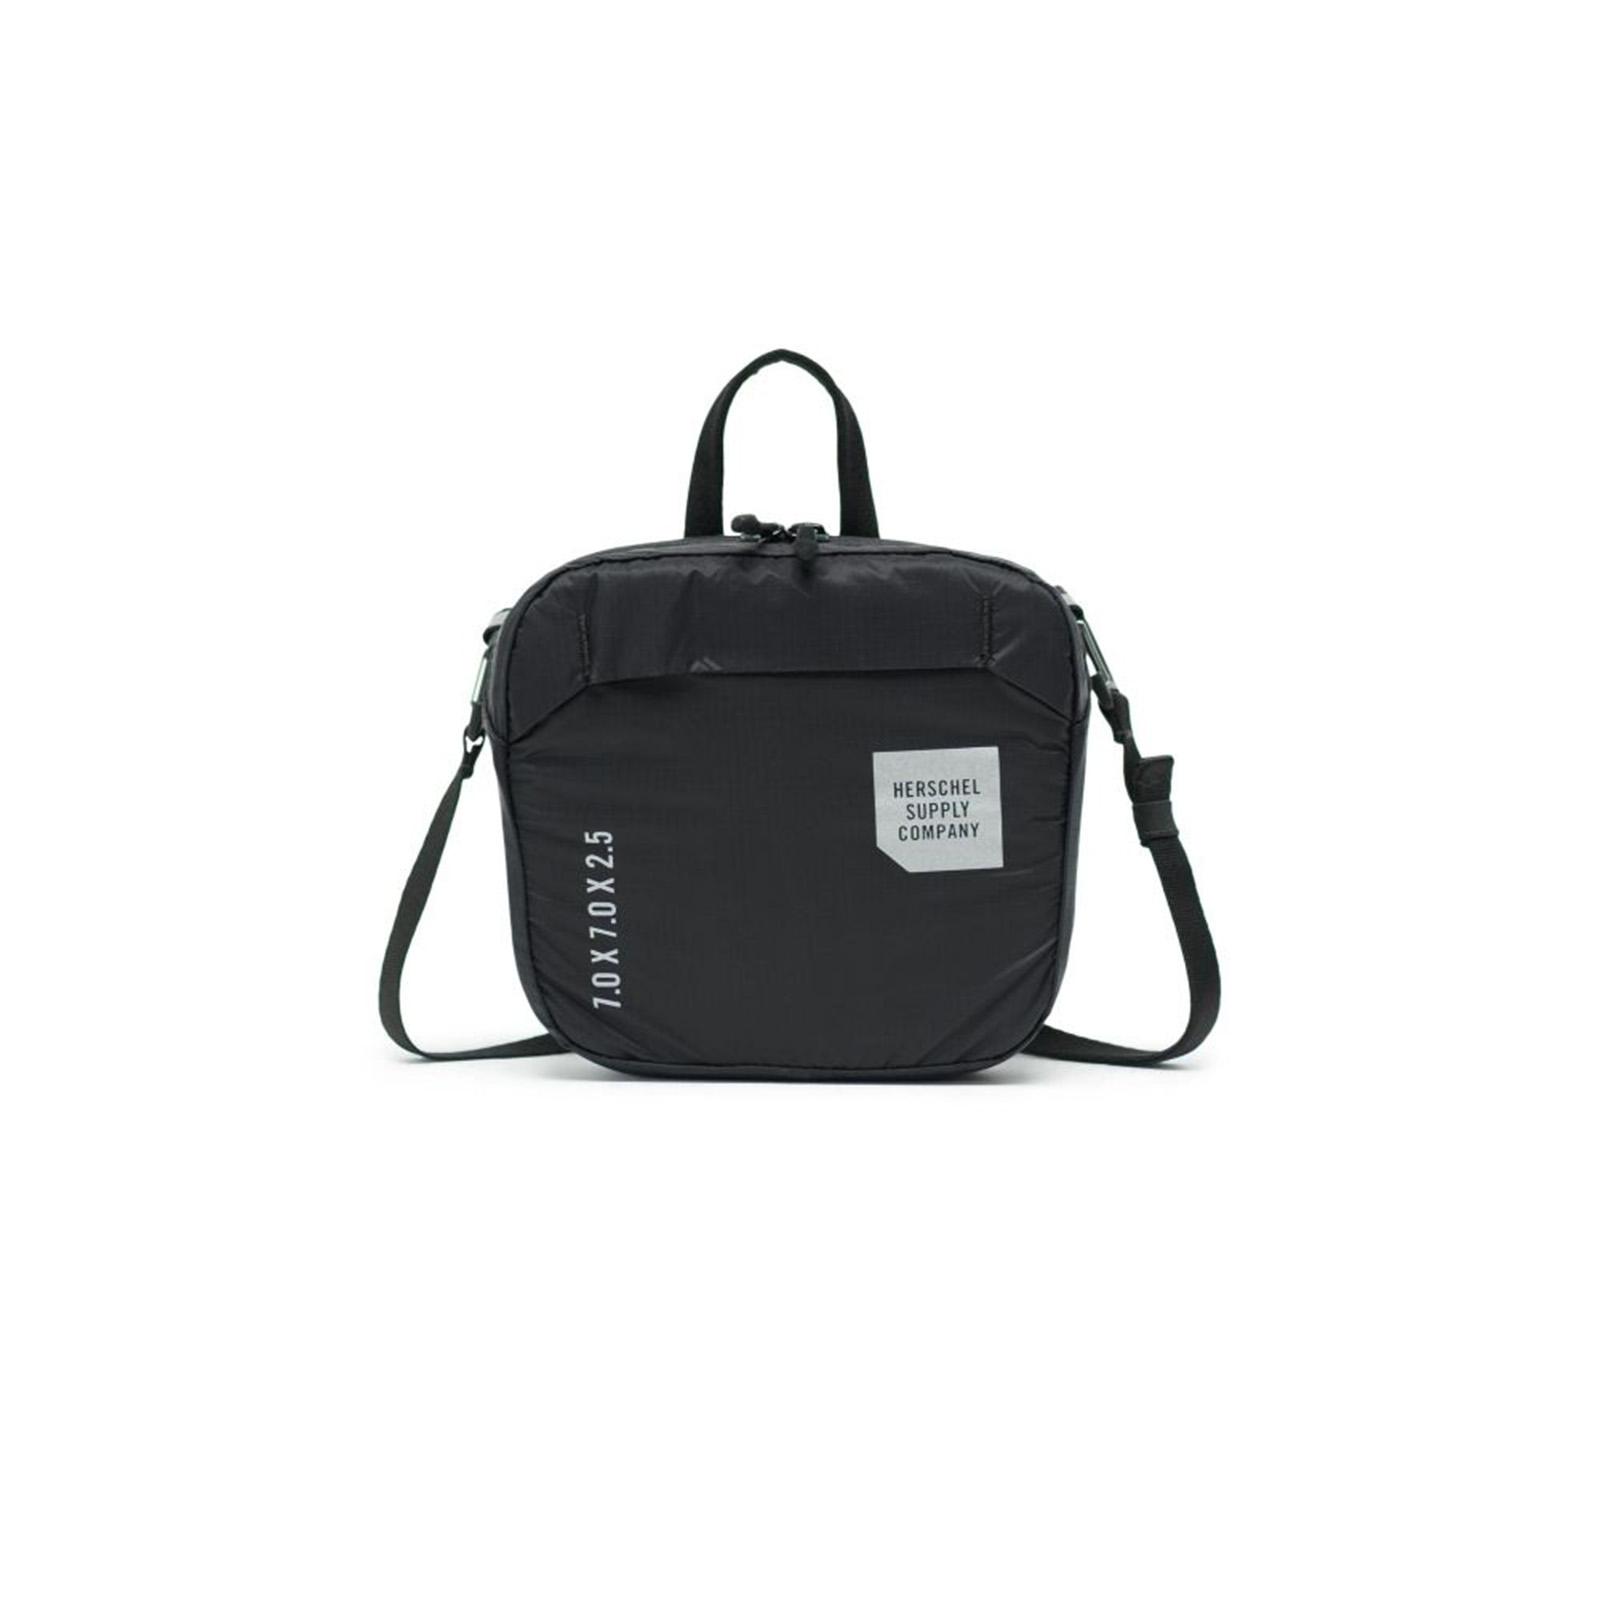 Herschel Ultralight Crossbody Black - Shoulder Bag Black